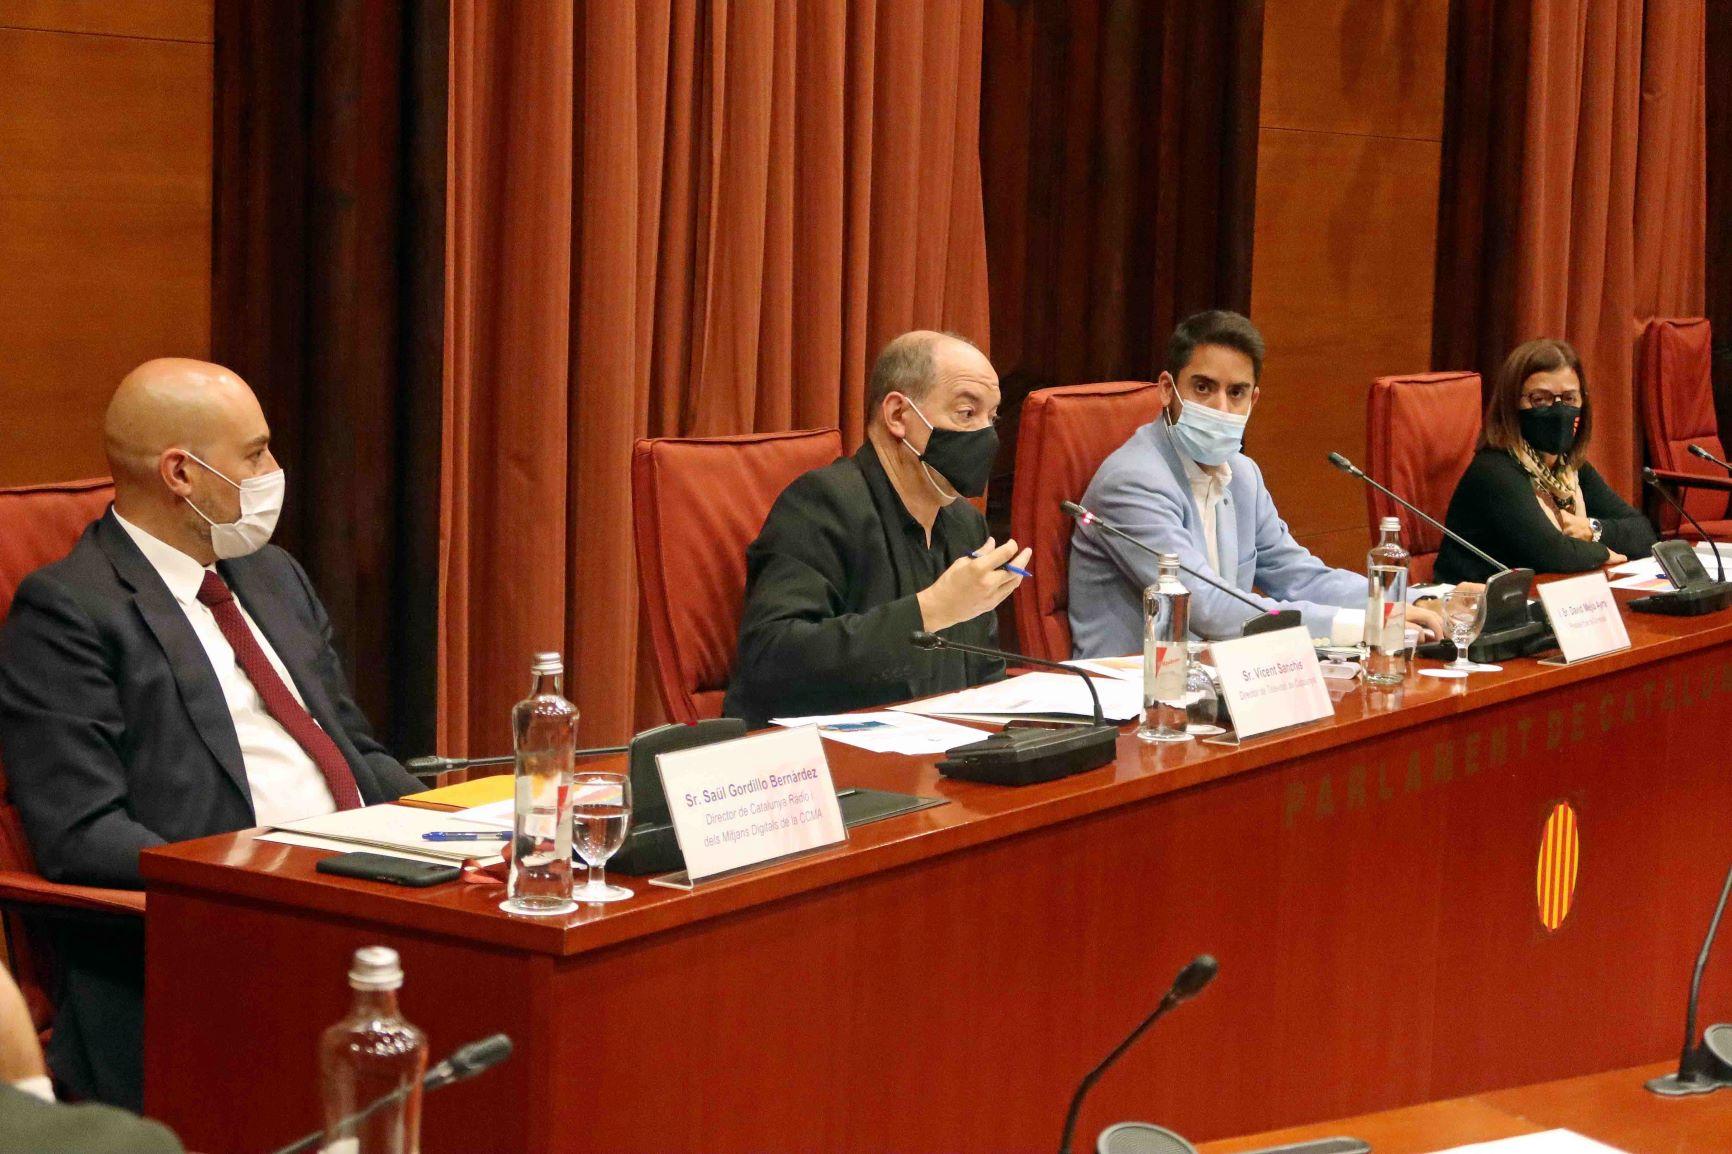 El director de TV3, Vicent Sanchis (c), junto a la directora de la CCMA, Núria Llorach (d), y el director de Catalunya Ràdio, Saül Gordillo (i), en una comisión de control en el Parlament durante la pasada legislatura / Parlament